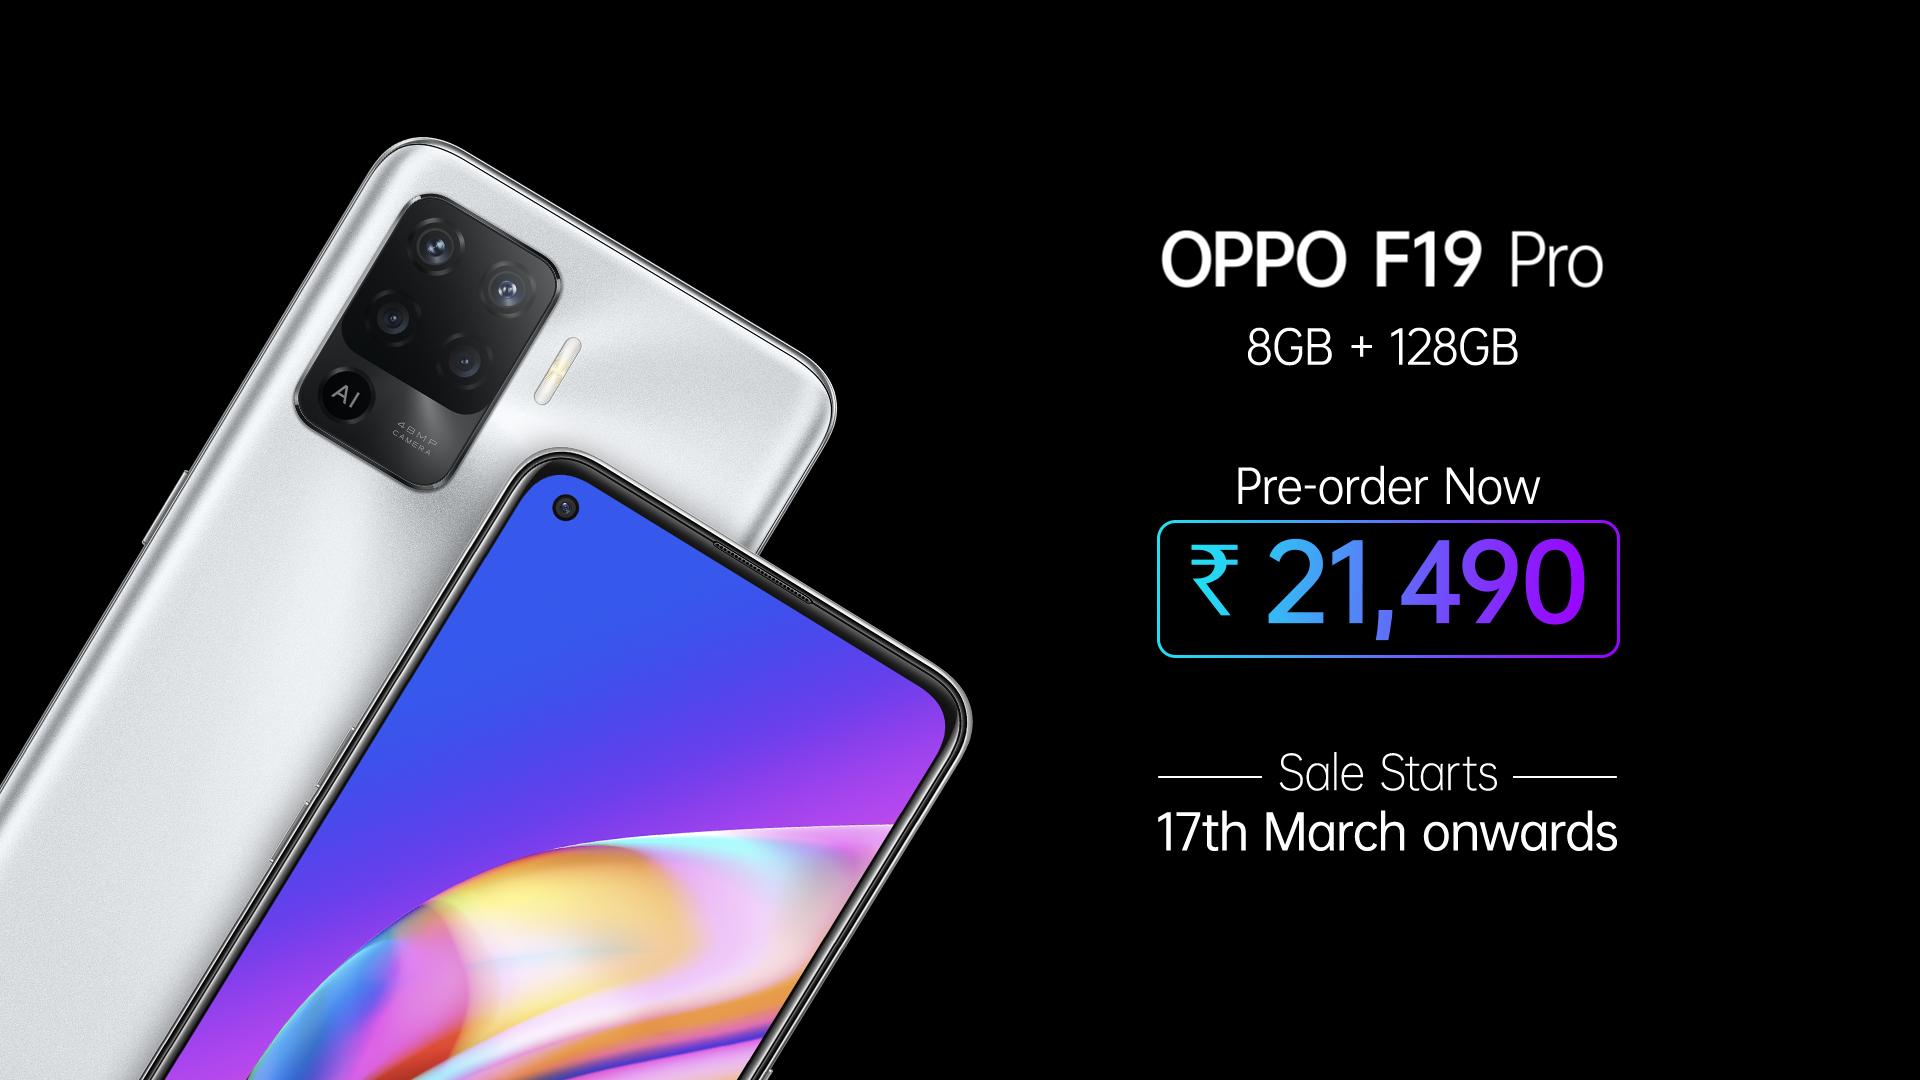 Oppo F19 Pro series